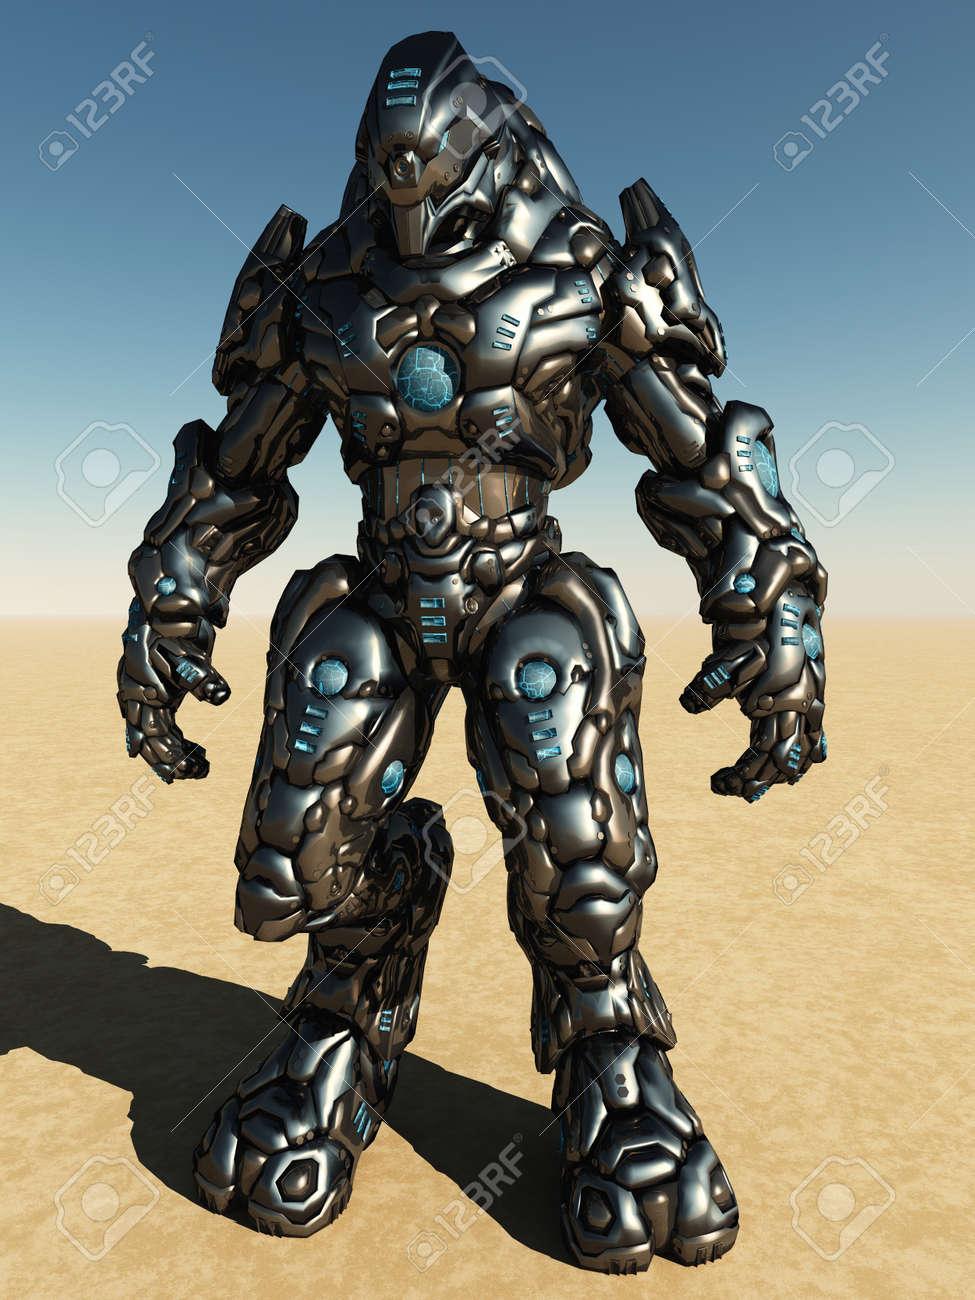 Futuristic science fiction battle droid in a desert landscape, 3d digitally rendered illustration Stock Illustration - 12860485